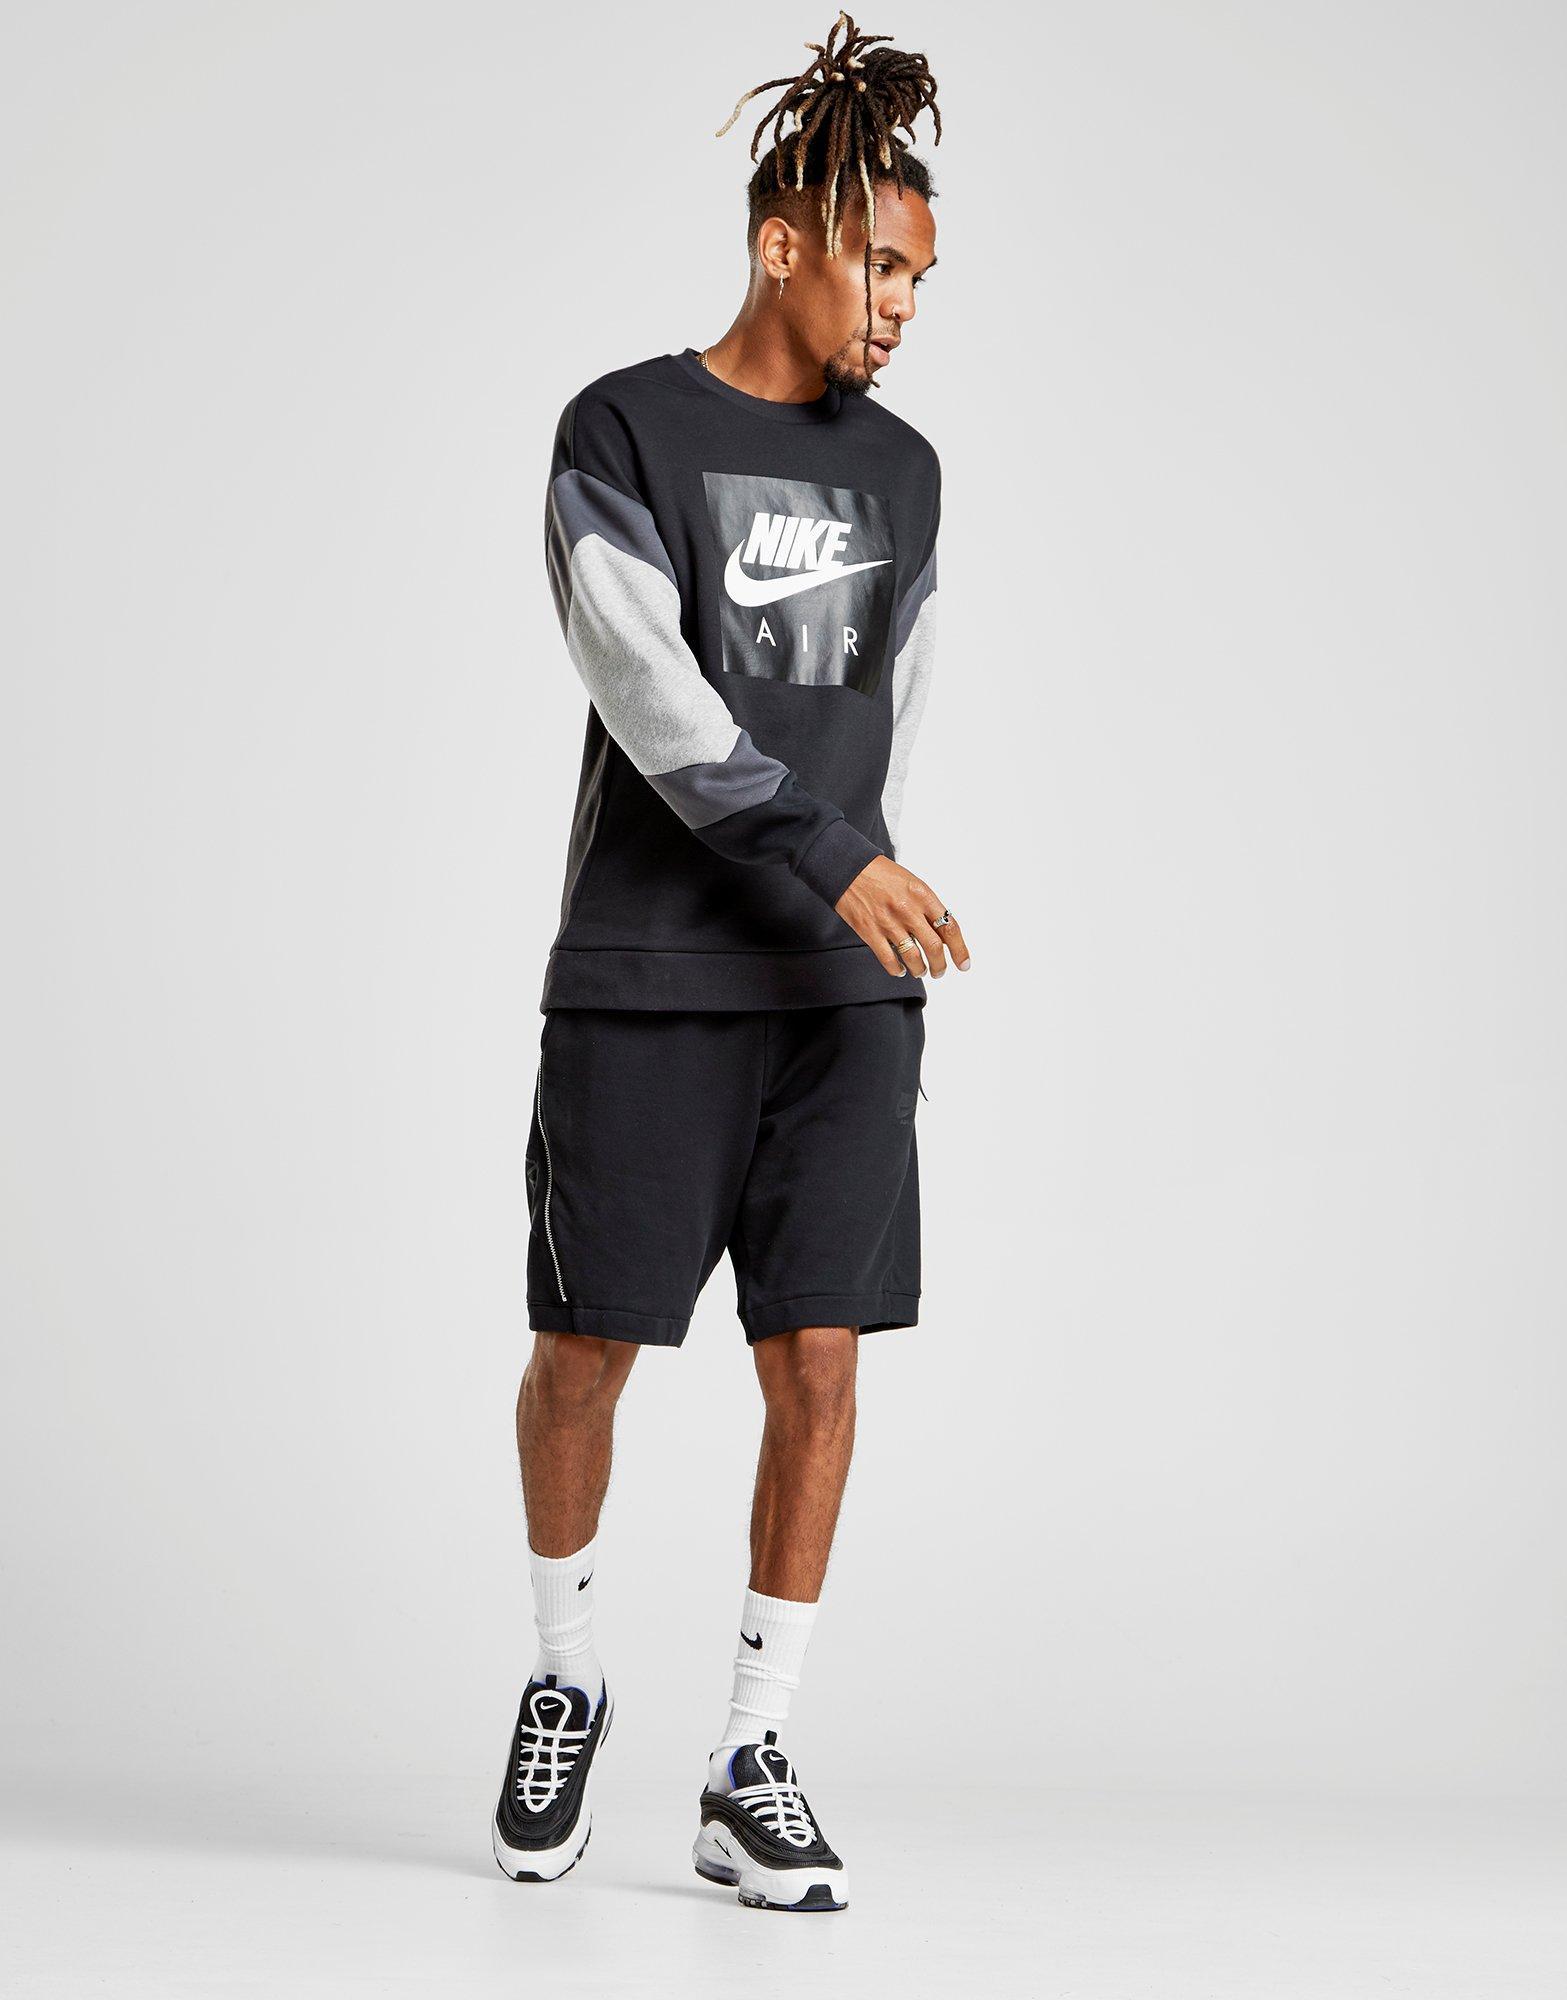 Nike For Men Lyst Sleeve Colour In Air Block Black Sweatshirt f1w1Cqd